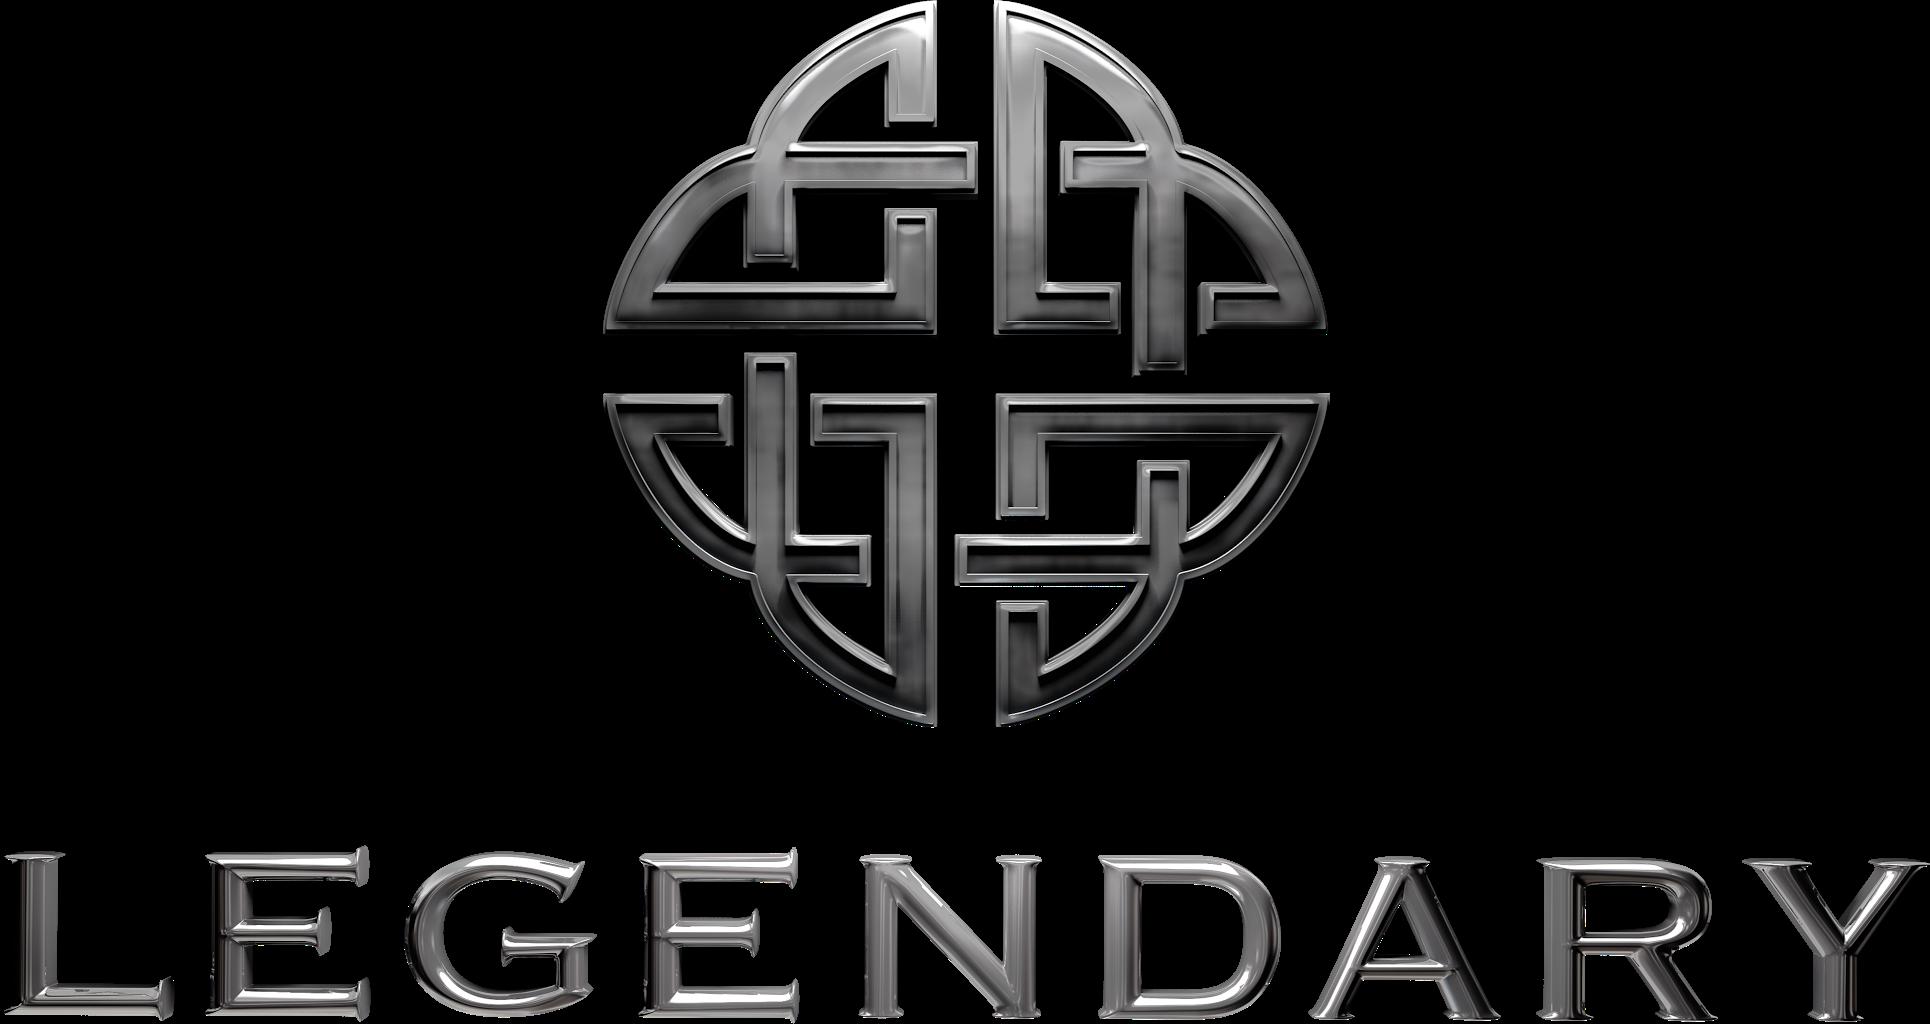 Legendary_logo.png